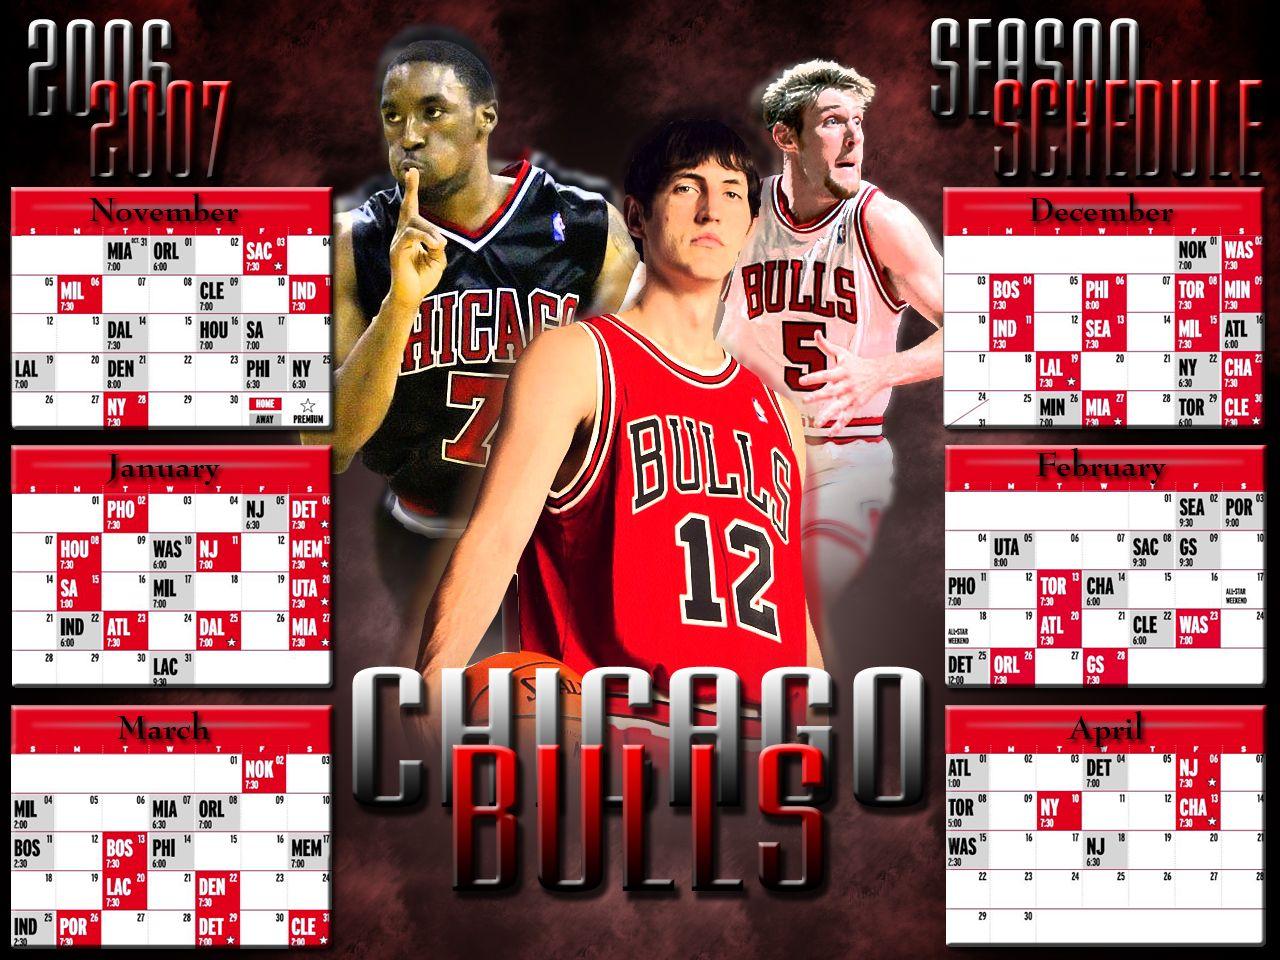 Chicago Bulls Fan Team schedule, Chicago bulls, Michael